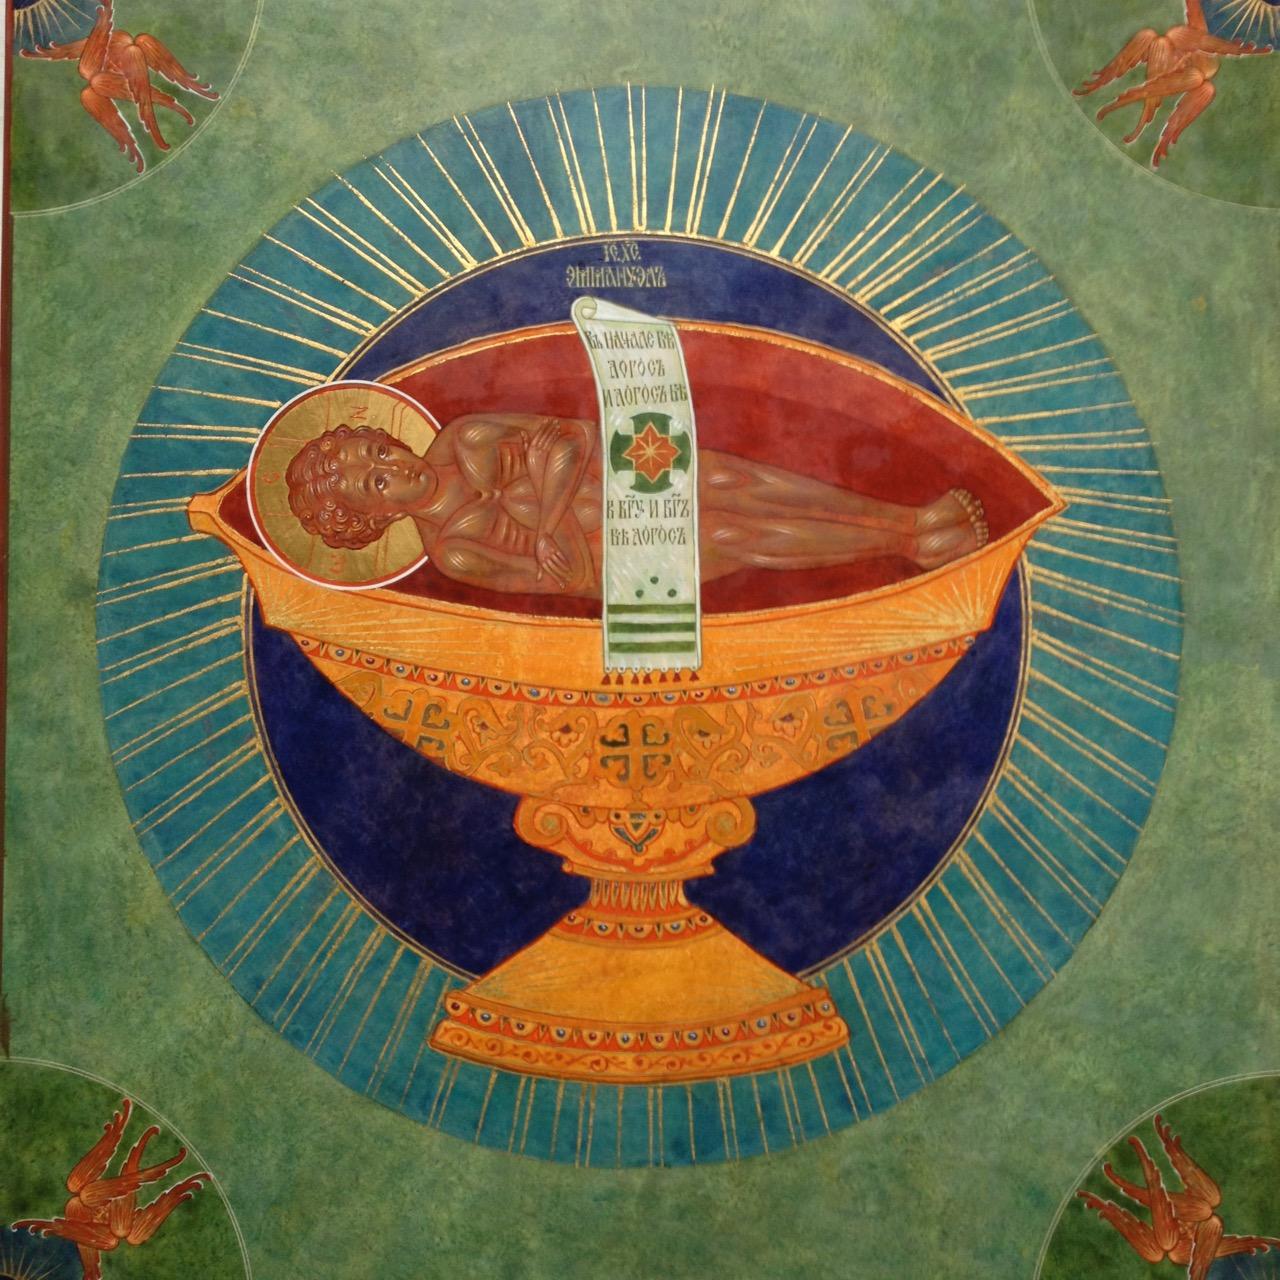 Christ Emmanuel, the Logos of the Eucharist